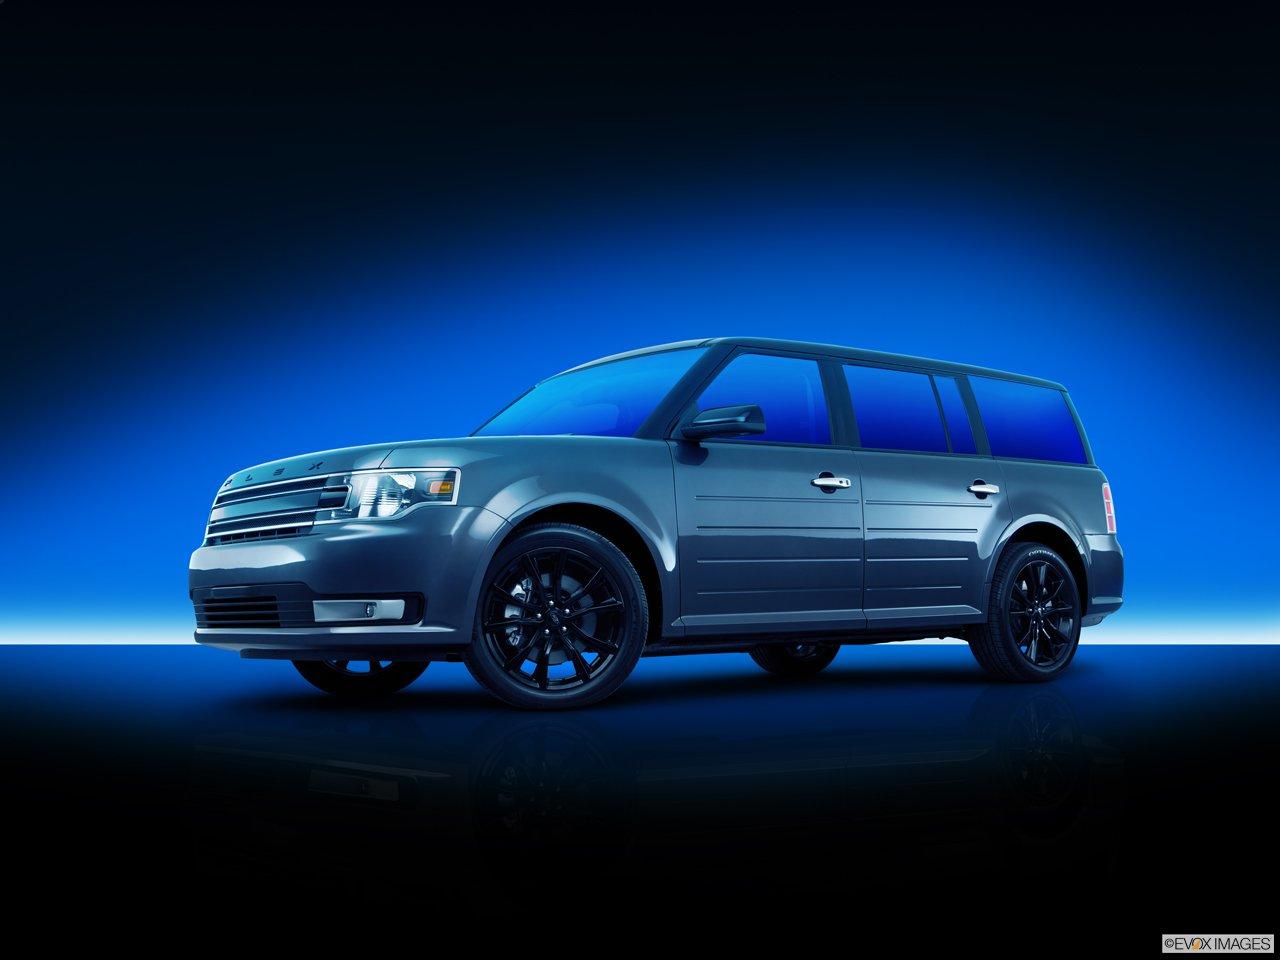 2016 Ford Flex Exterior Overview